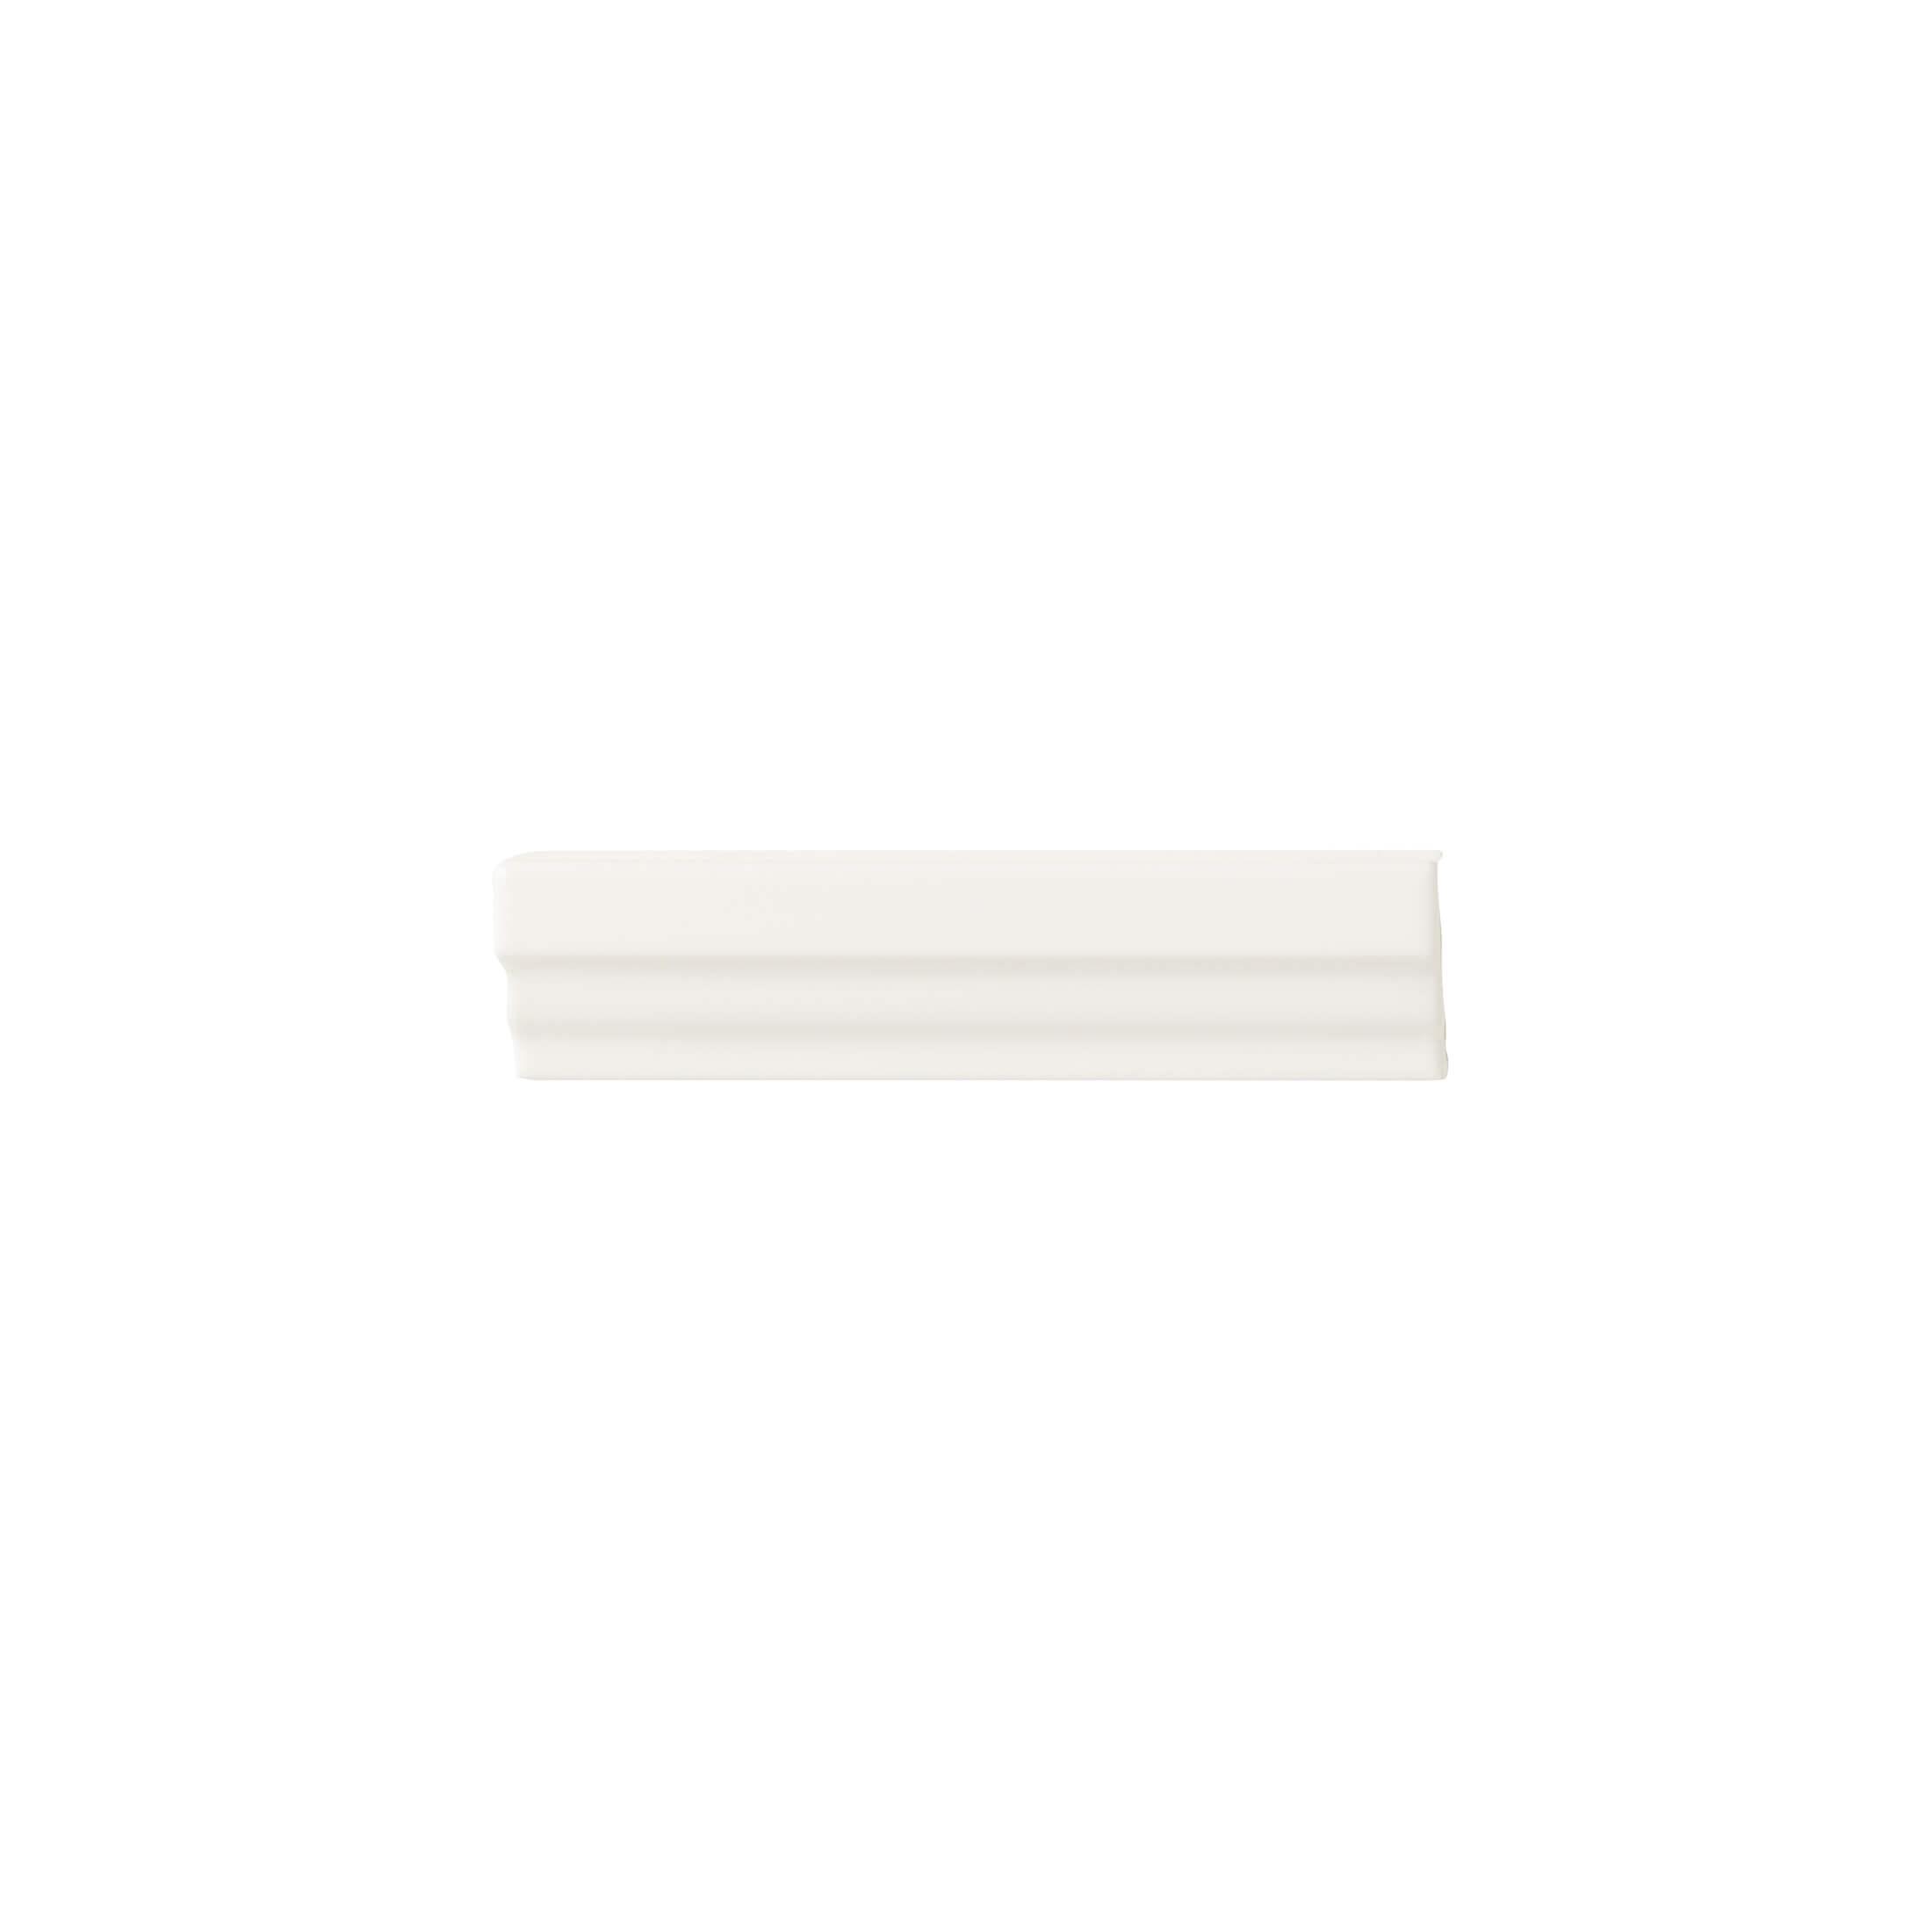 ADNE5330 - CORNISA CLASICA - 3,5 cm X 15 cm